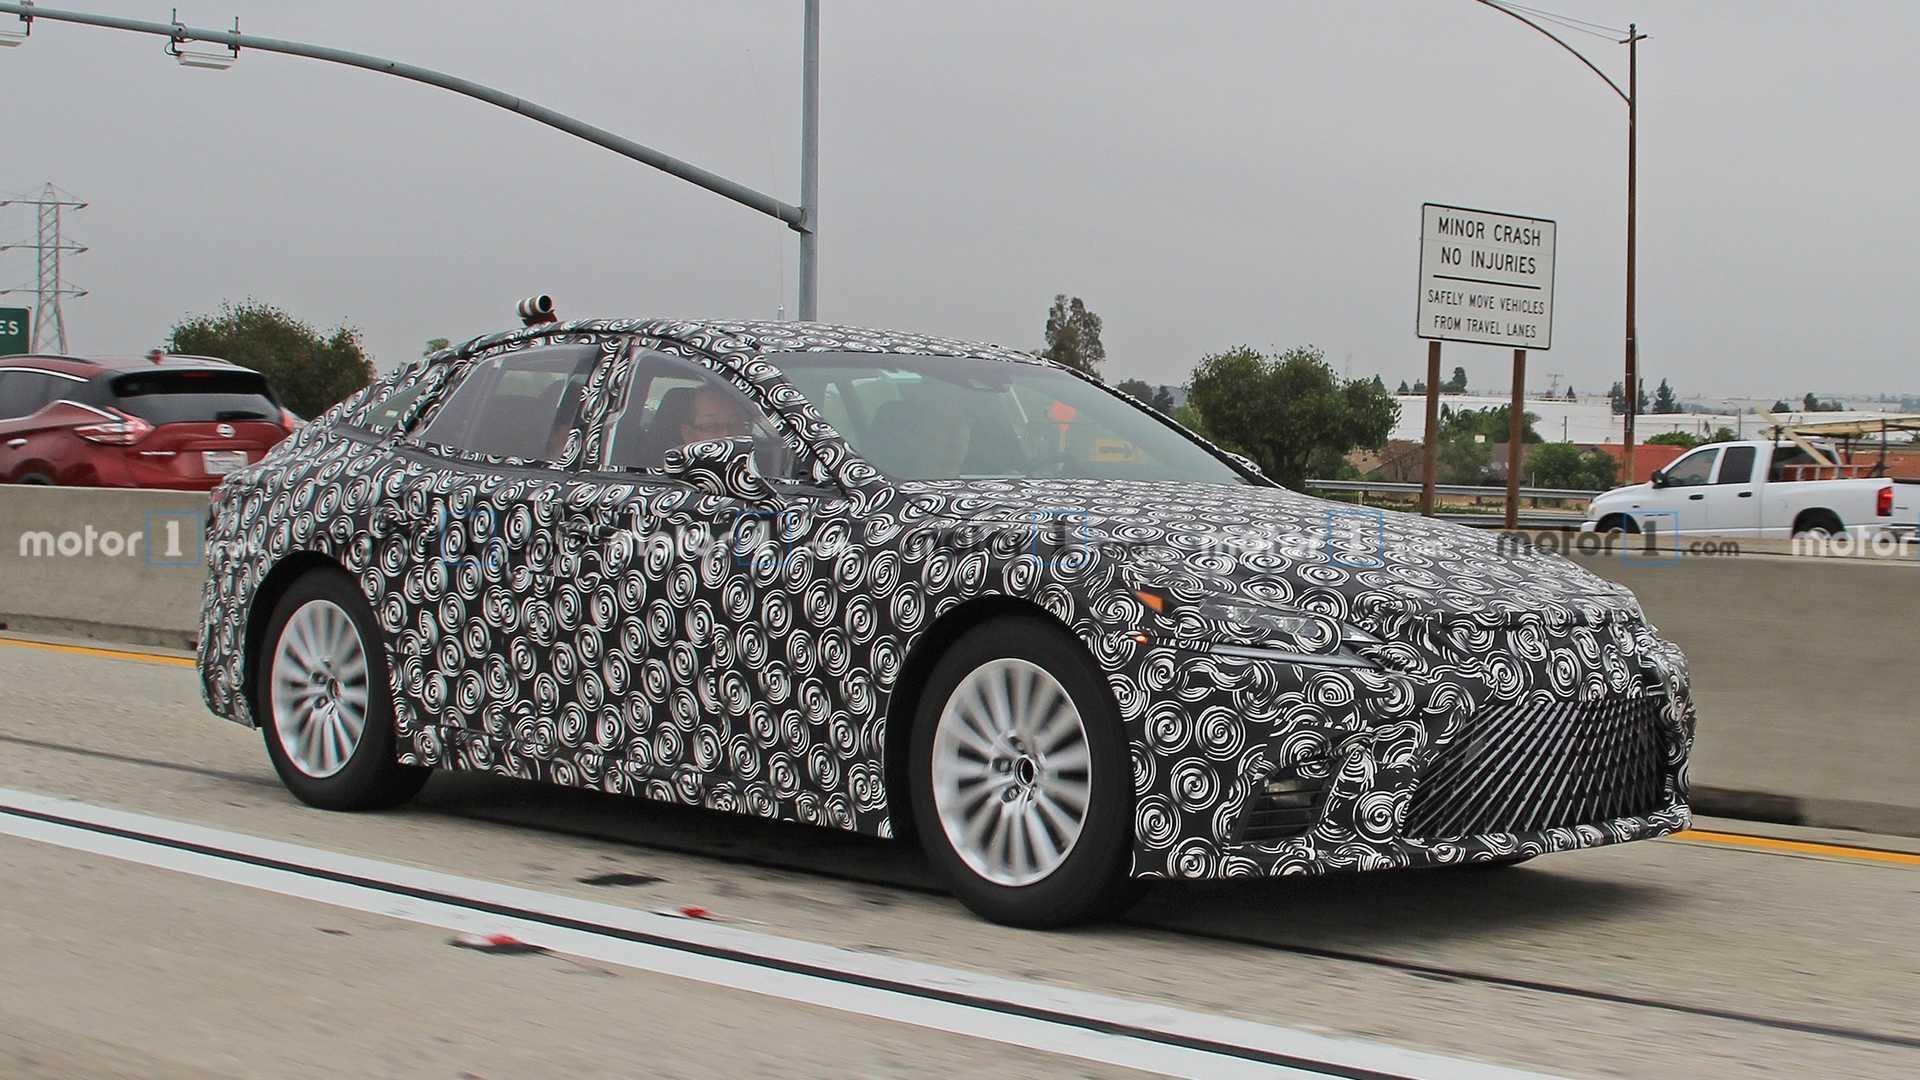 Lexus LS Hydrogen Fuel Cell Prototype Spied Testing, Coming Soon